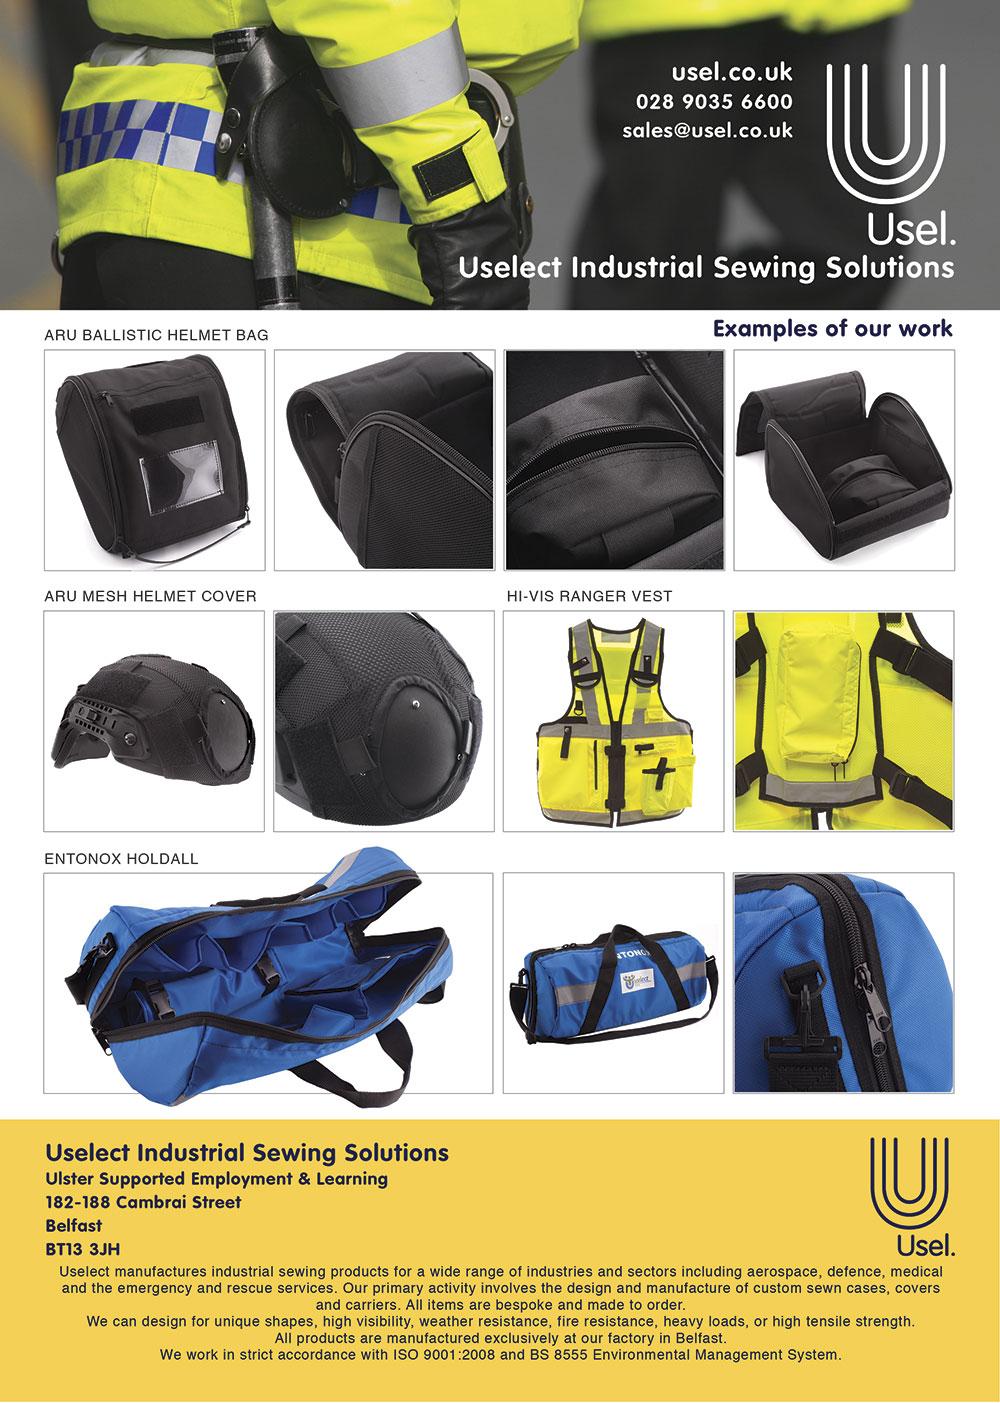 usel-brochure-example-1.jpg